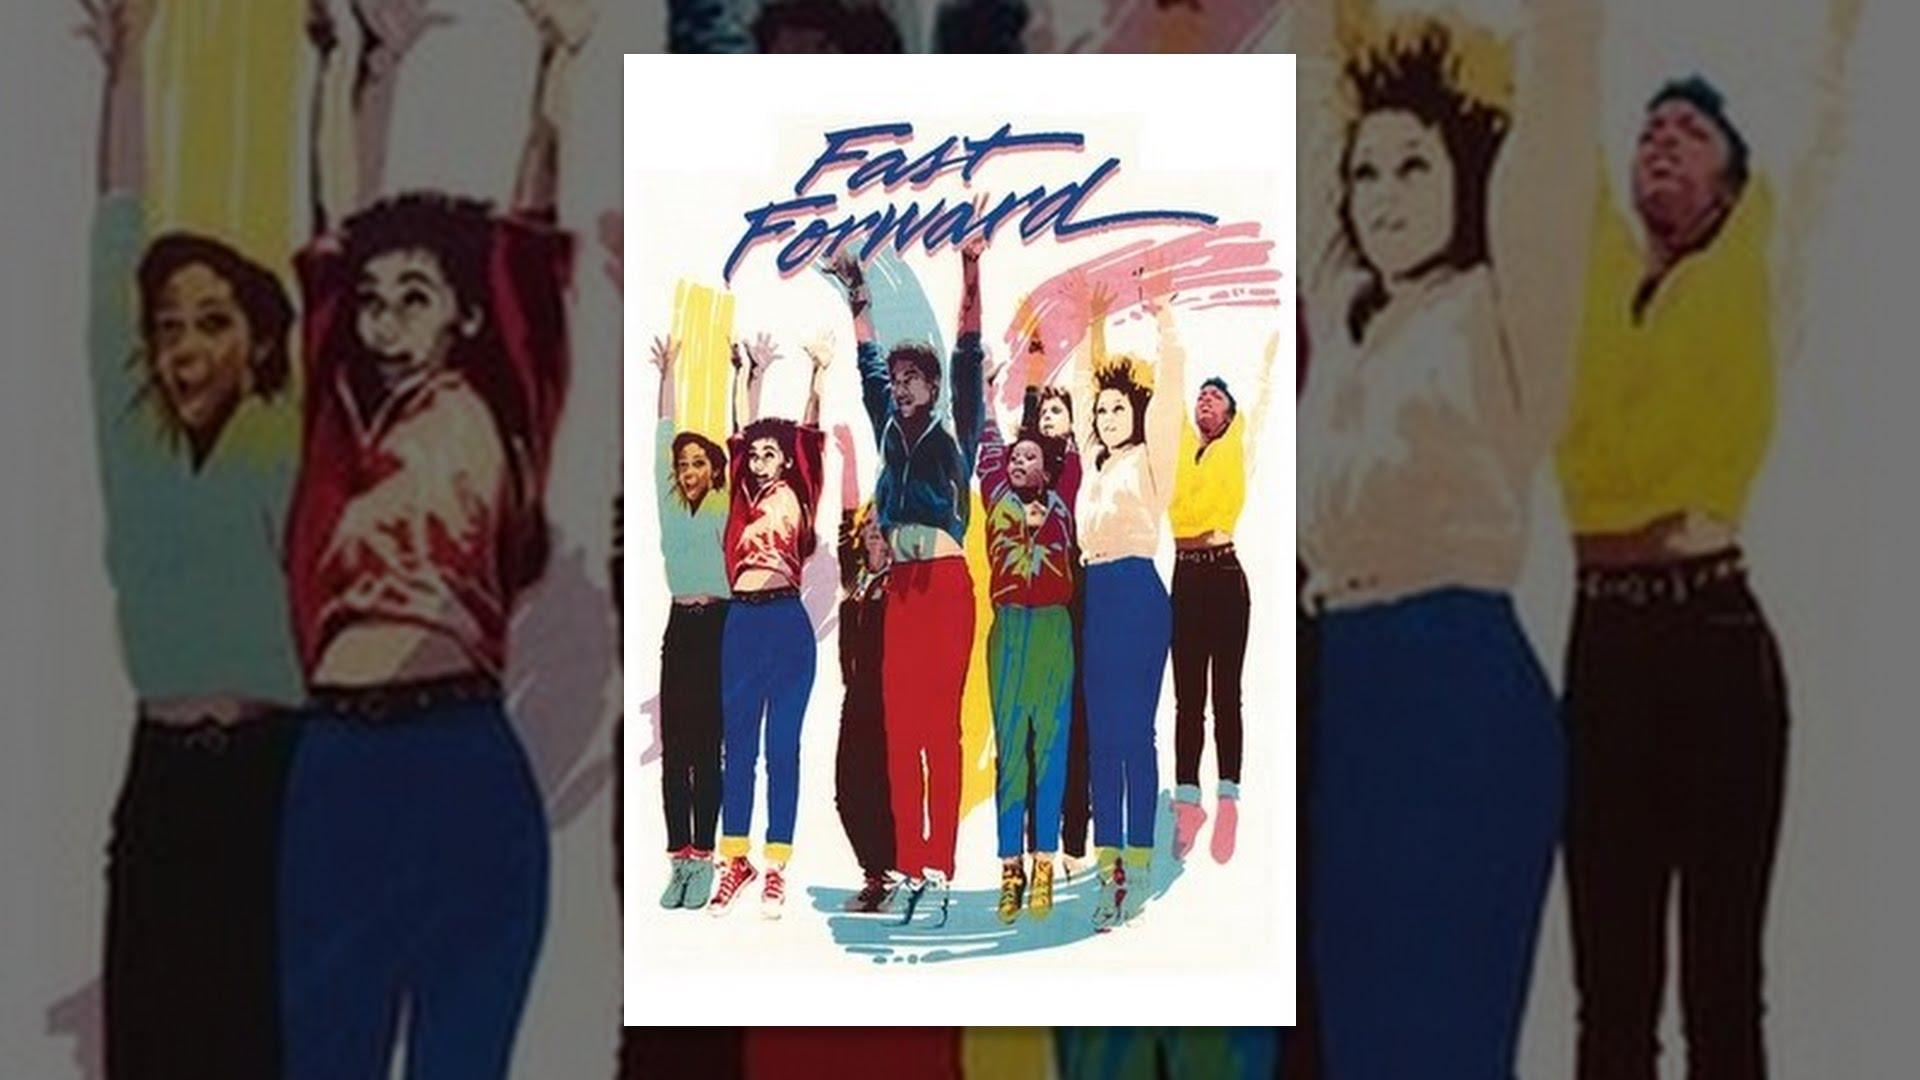 Fast Forward (1985) - YouTube